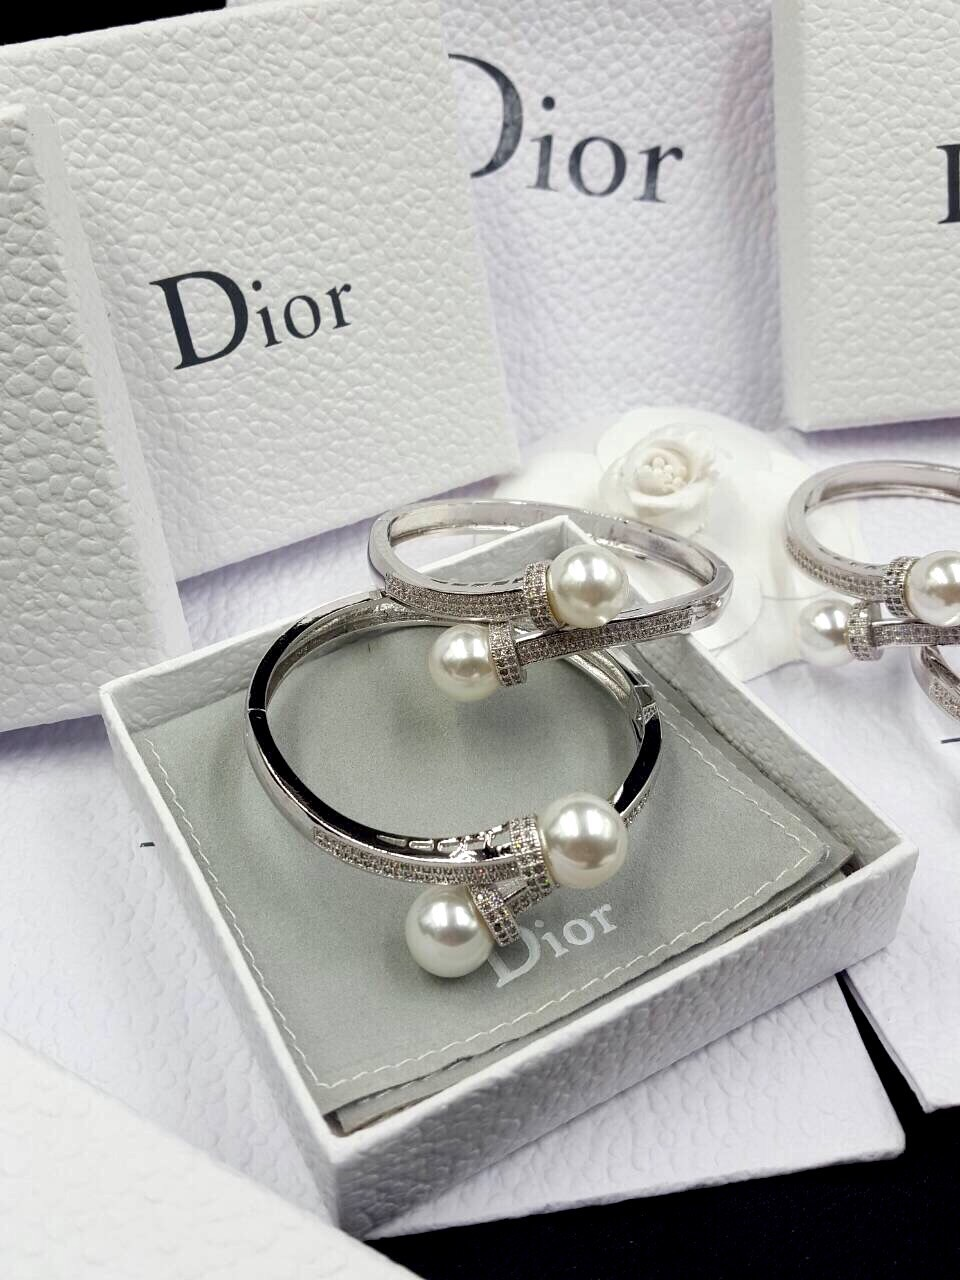 Pearl Bracelet & Ring กำไลเพชร CZ แท้ประดับมุก